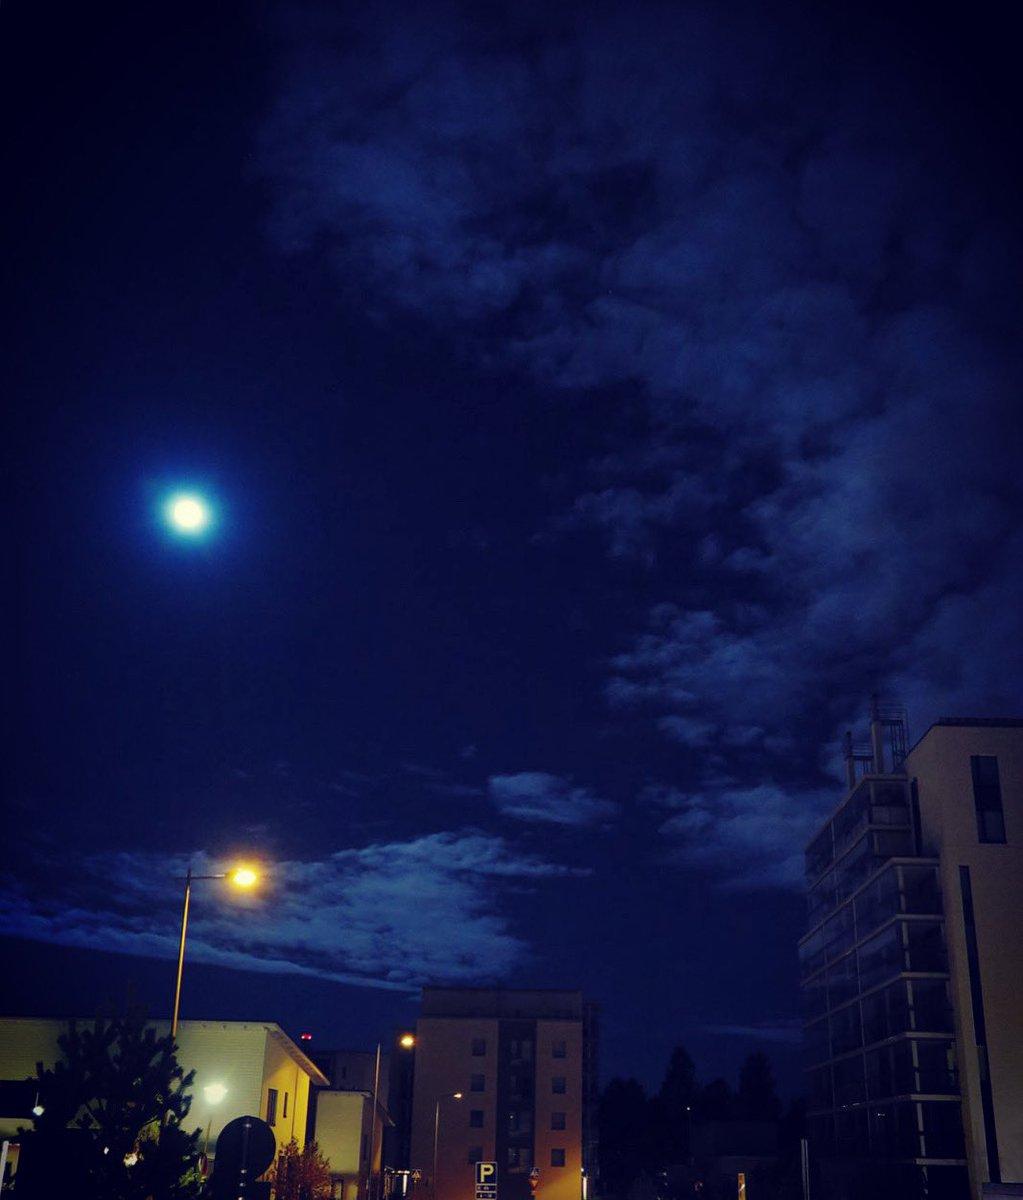 #skywatching #moon #eyeinthesky #night #darkskies